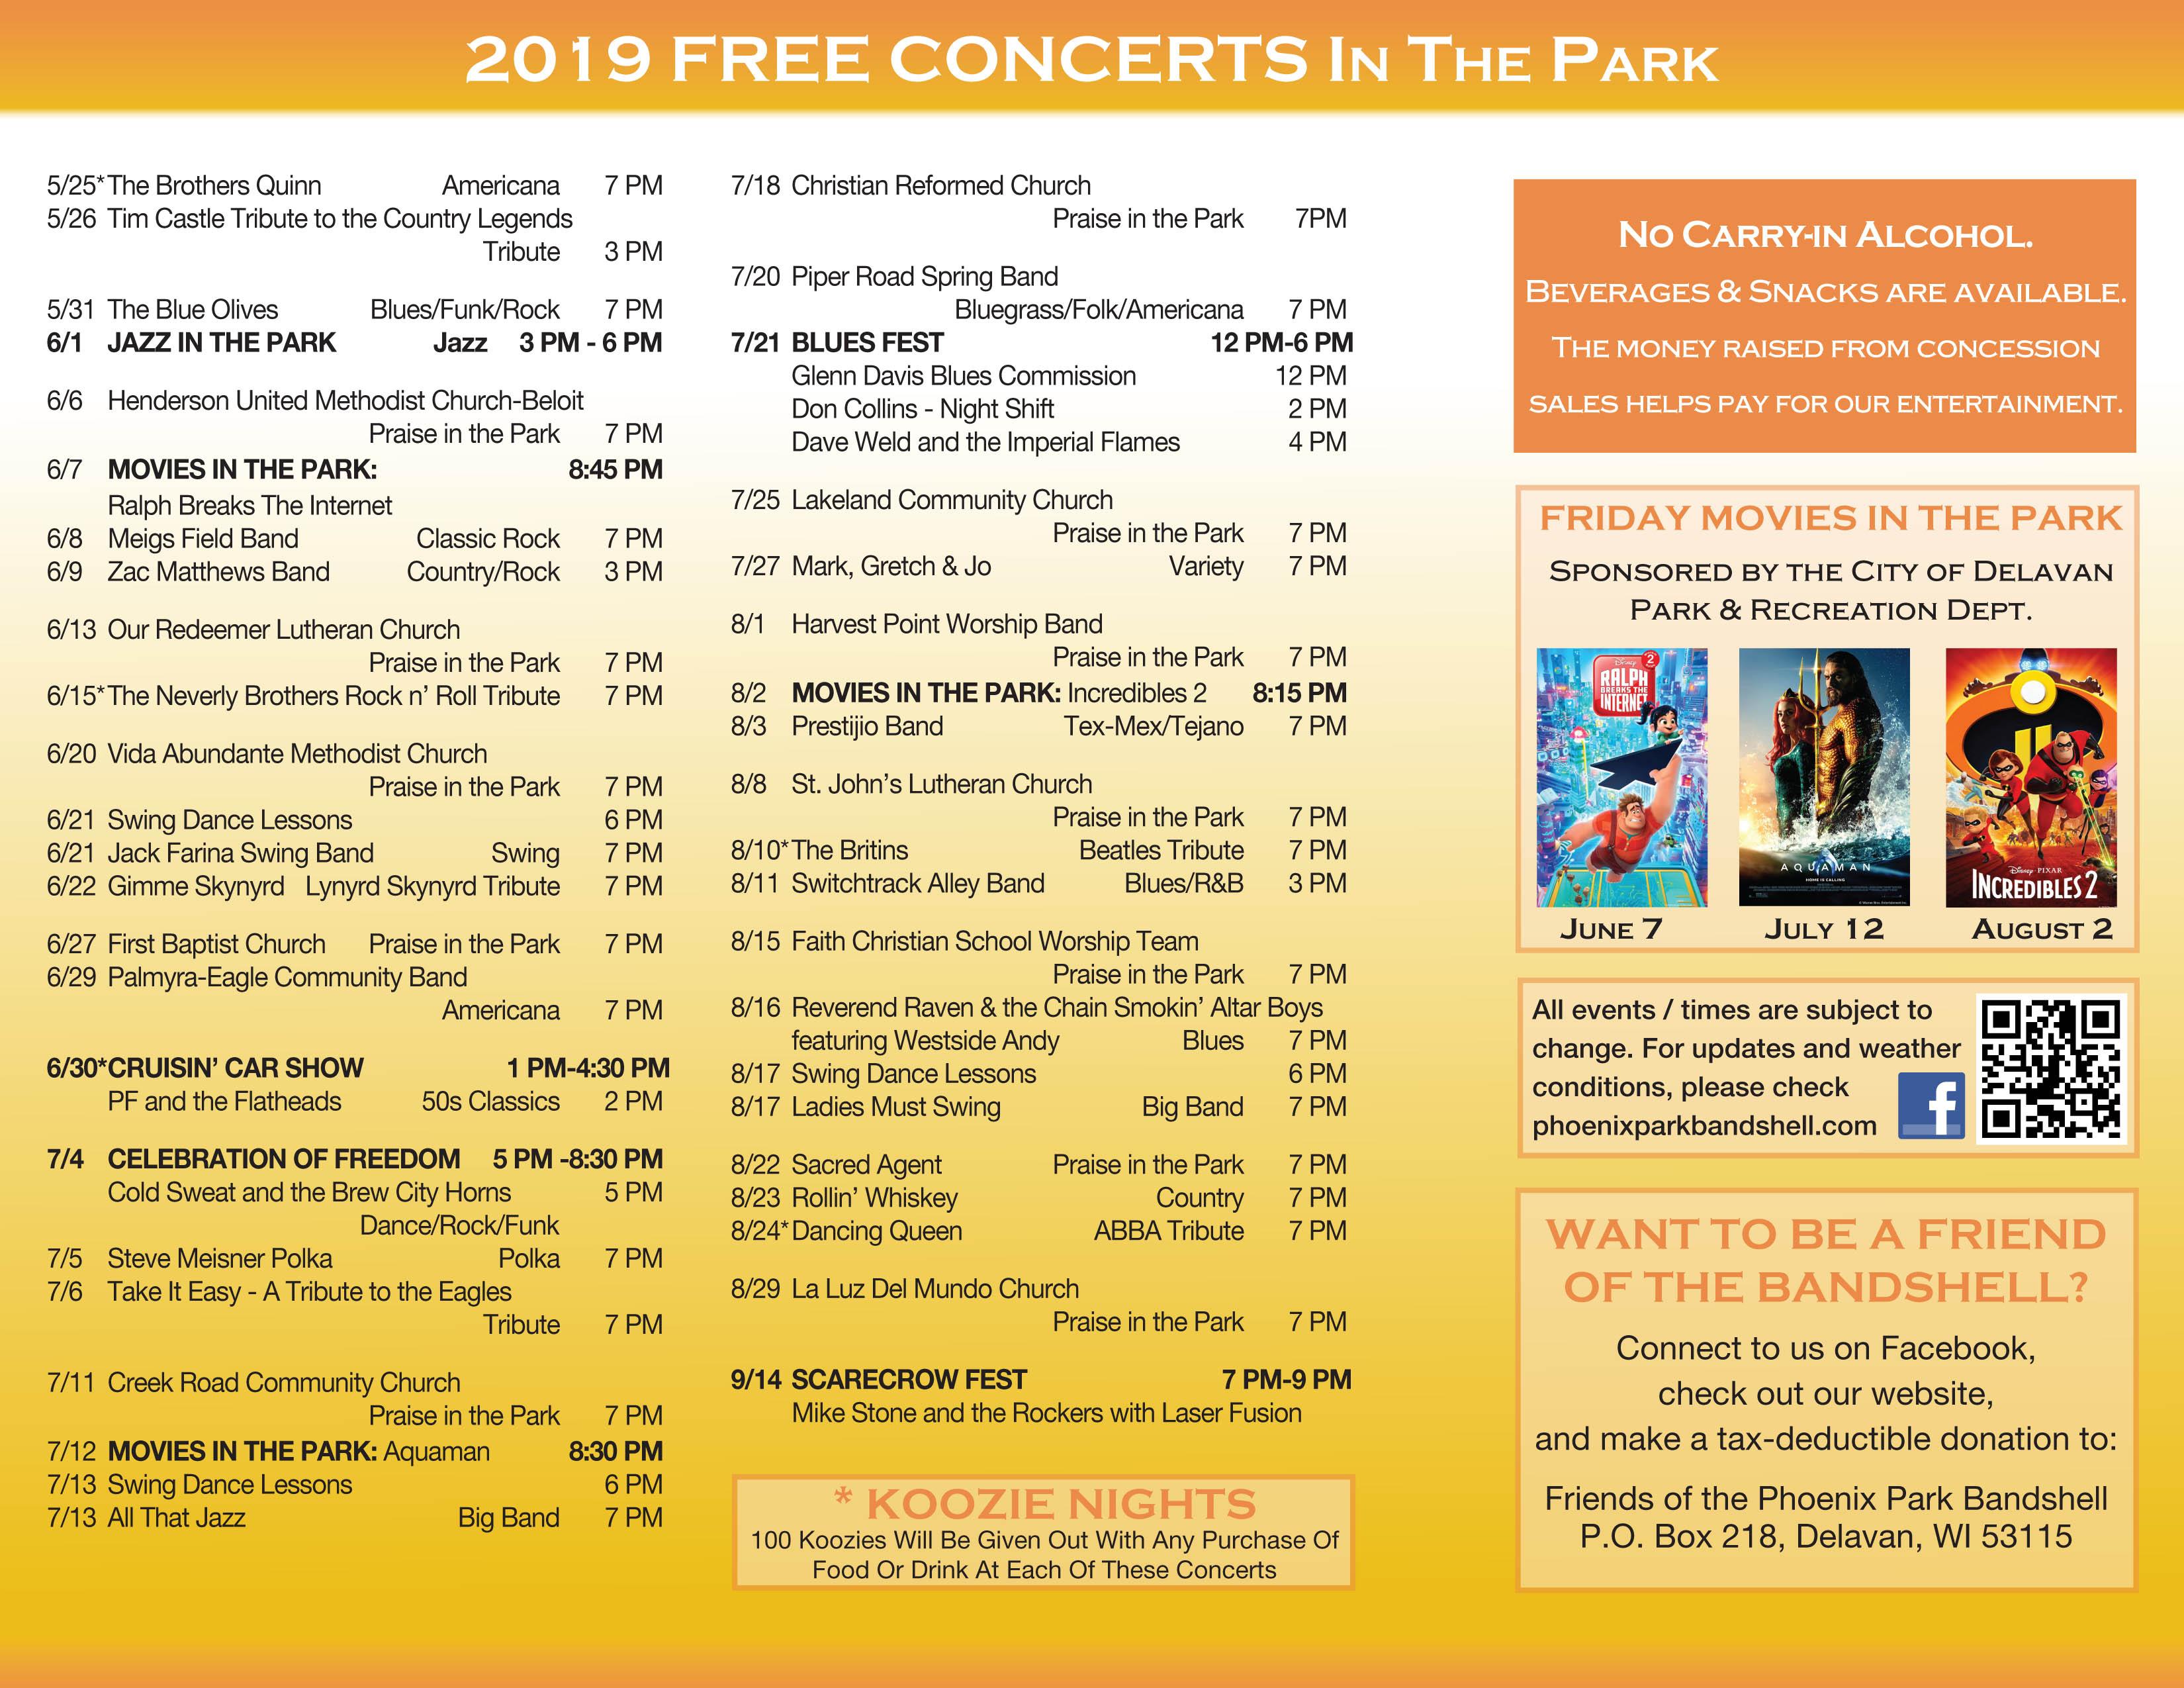 Phoenix Park Bandshell in Delavan WI – Free Concerts All Summer Long!!!